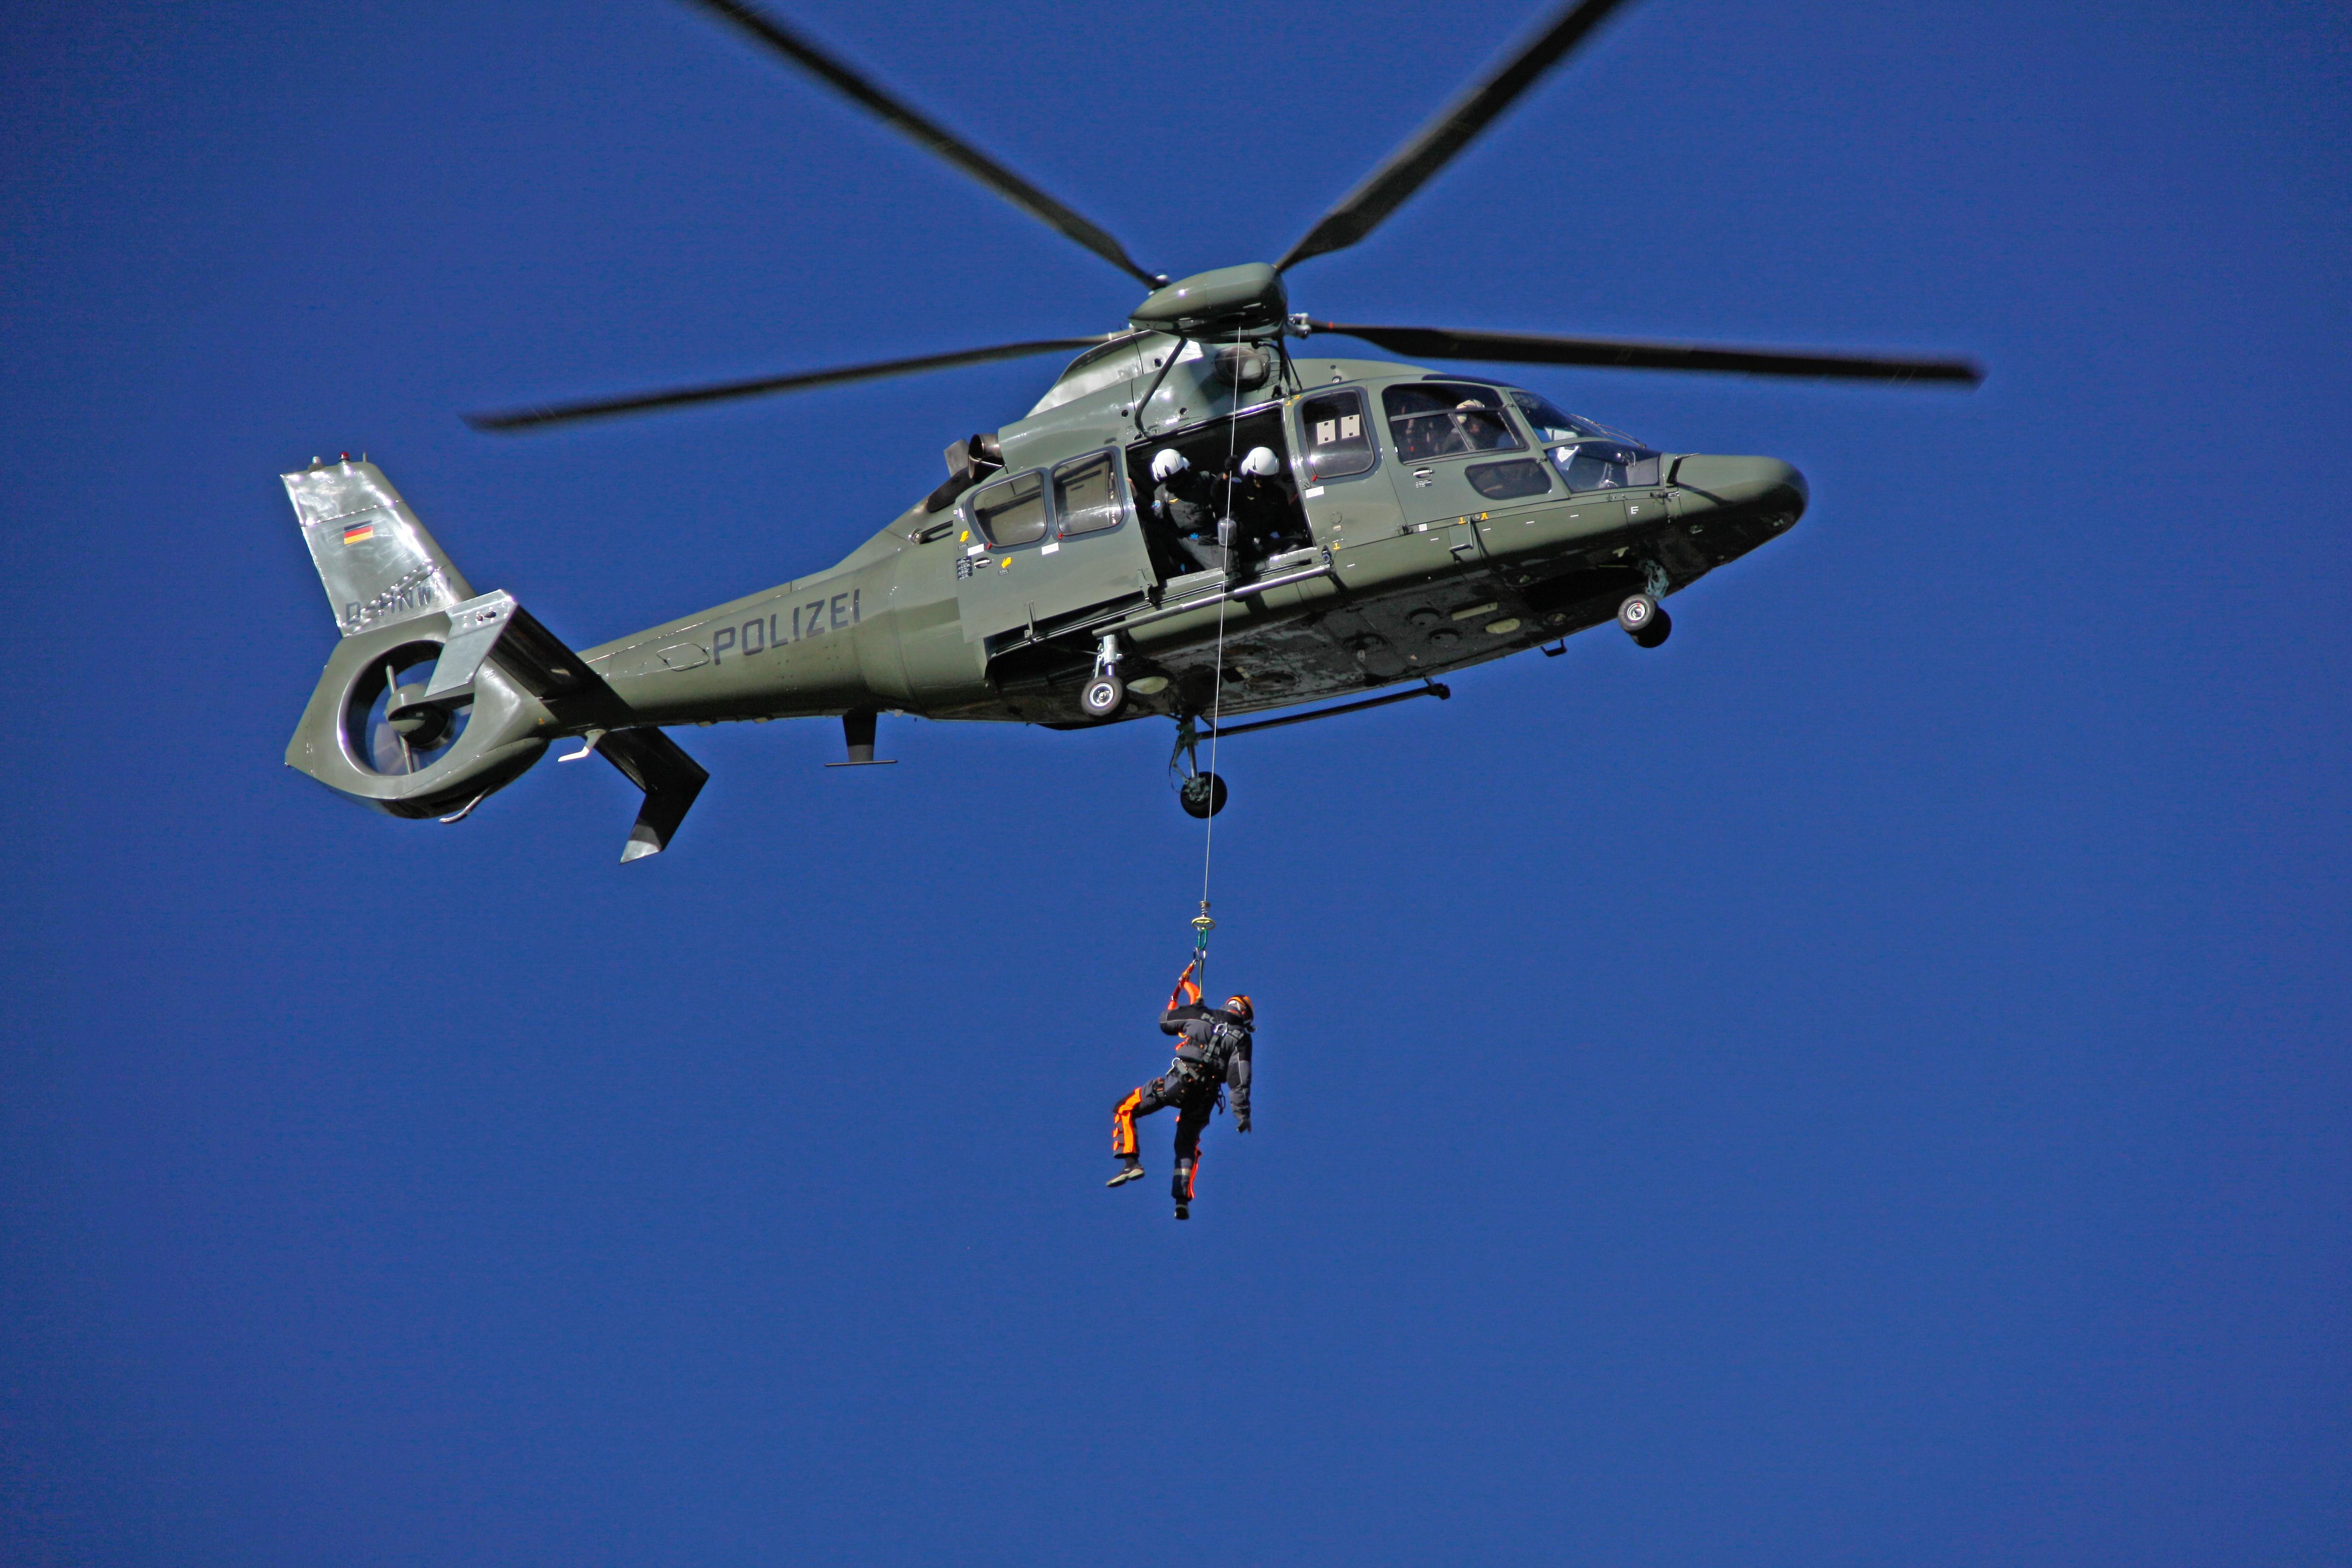 Helicopter money, idea prende piede anche in Europa